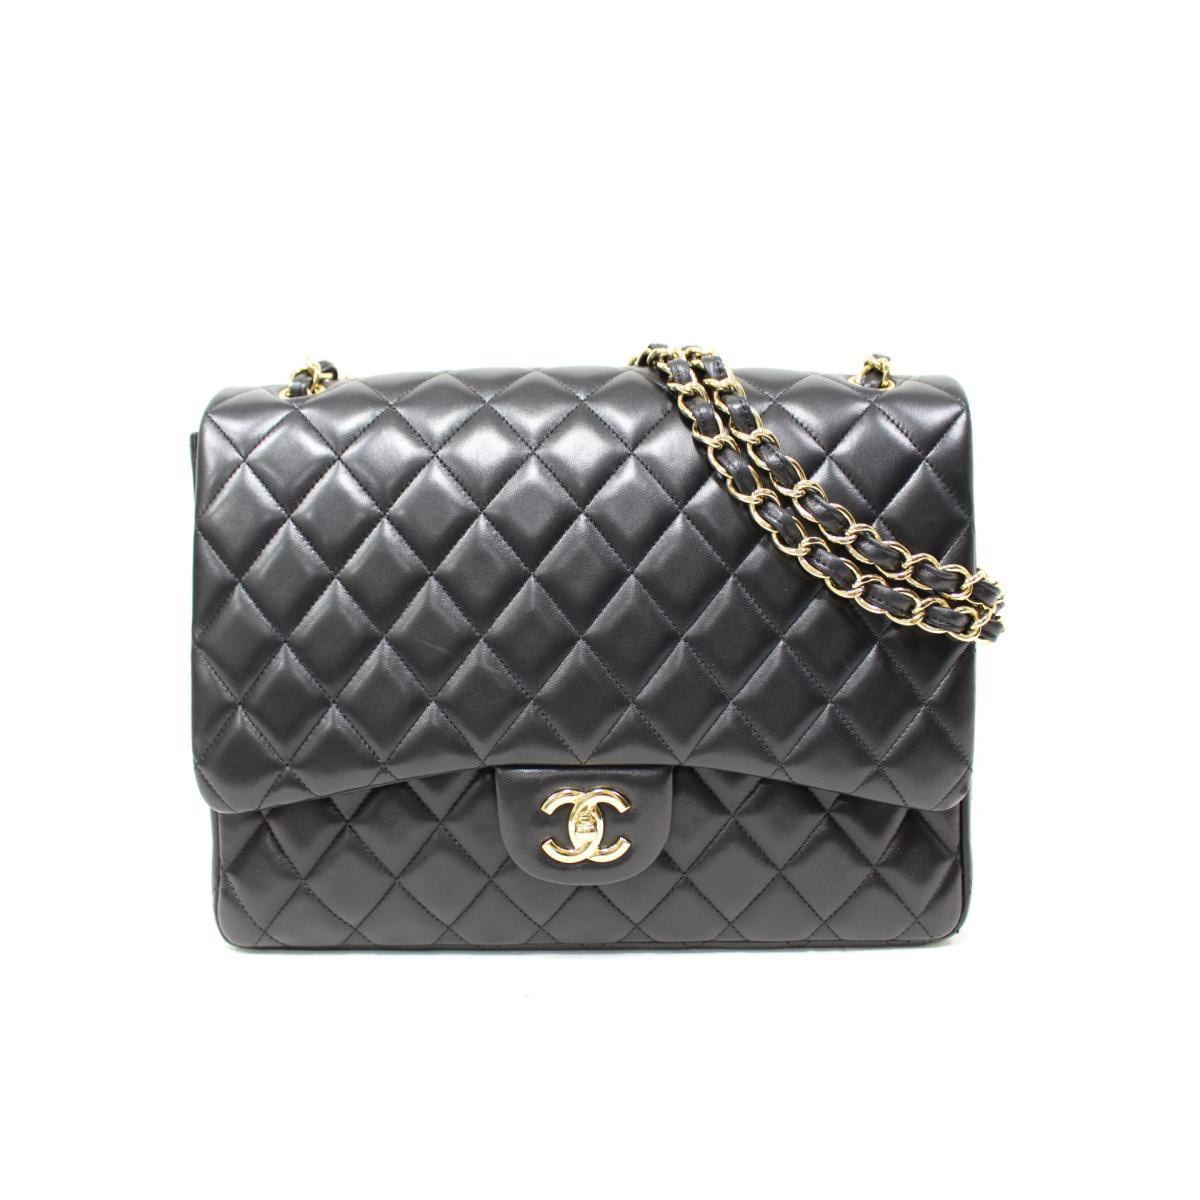 696997c2dd41 BRANDOFF  Authentic CHANEL Jumbo Matelasse W Flap Chain Shoulder Bag ...